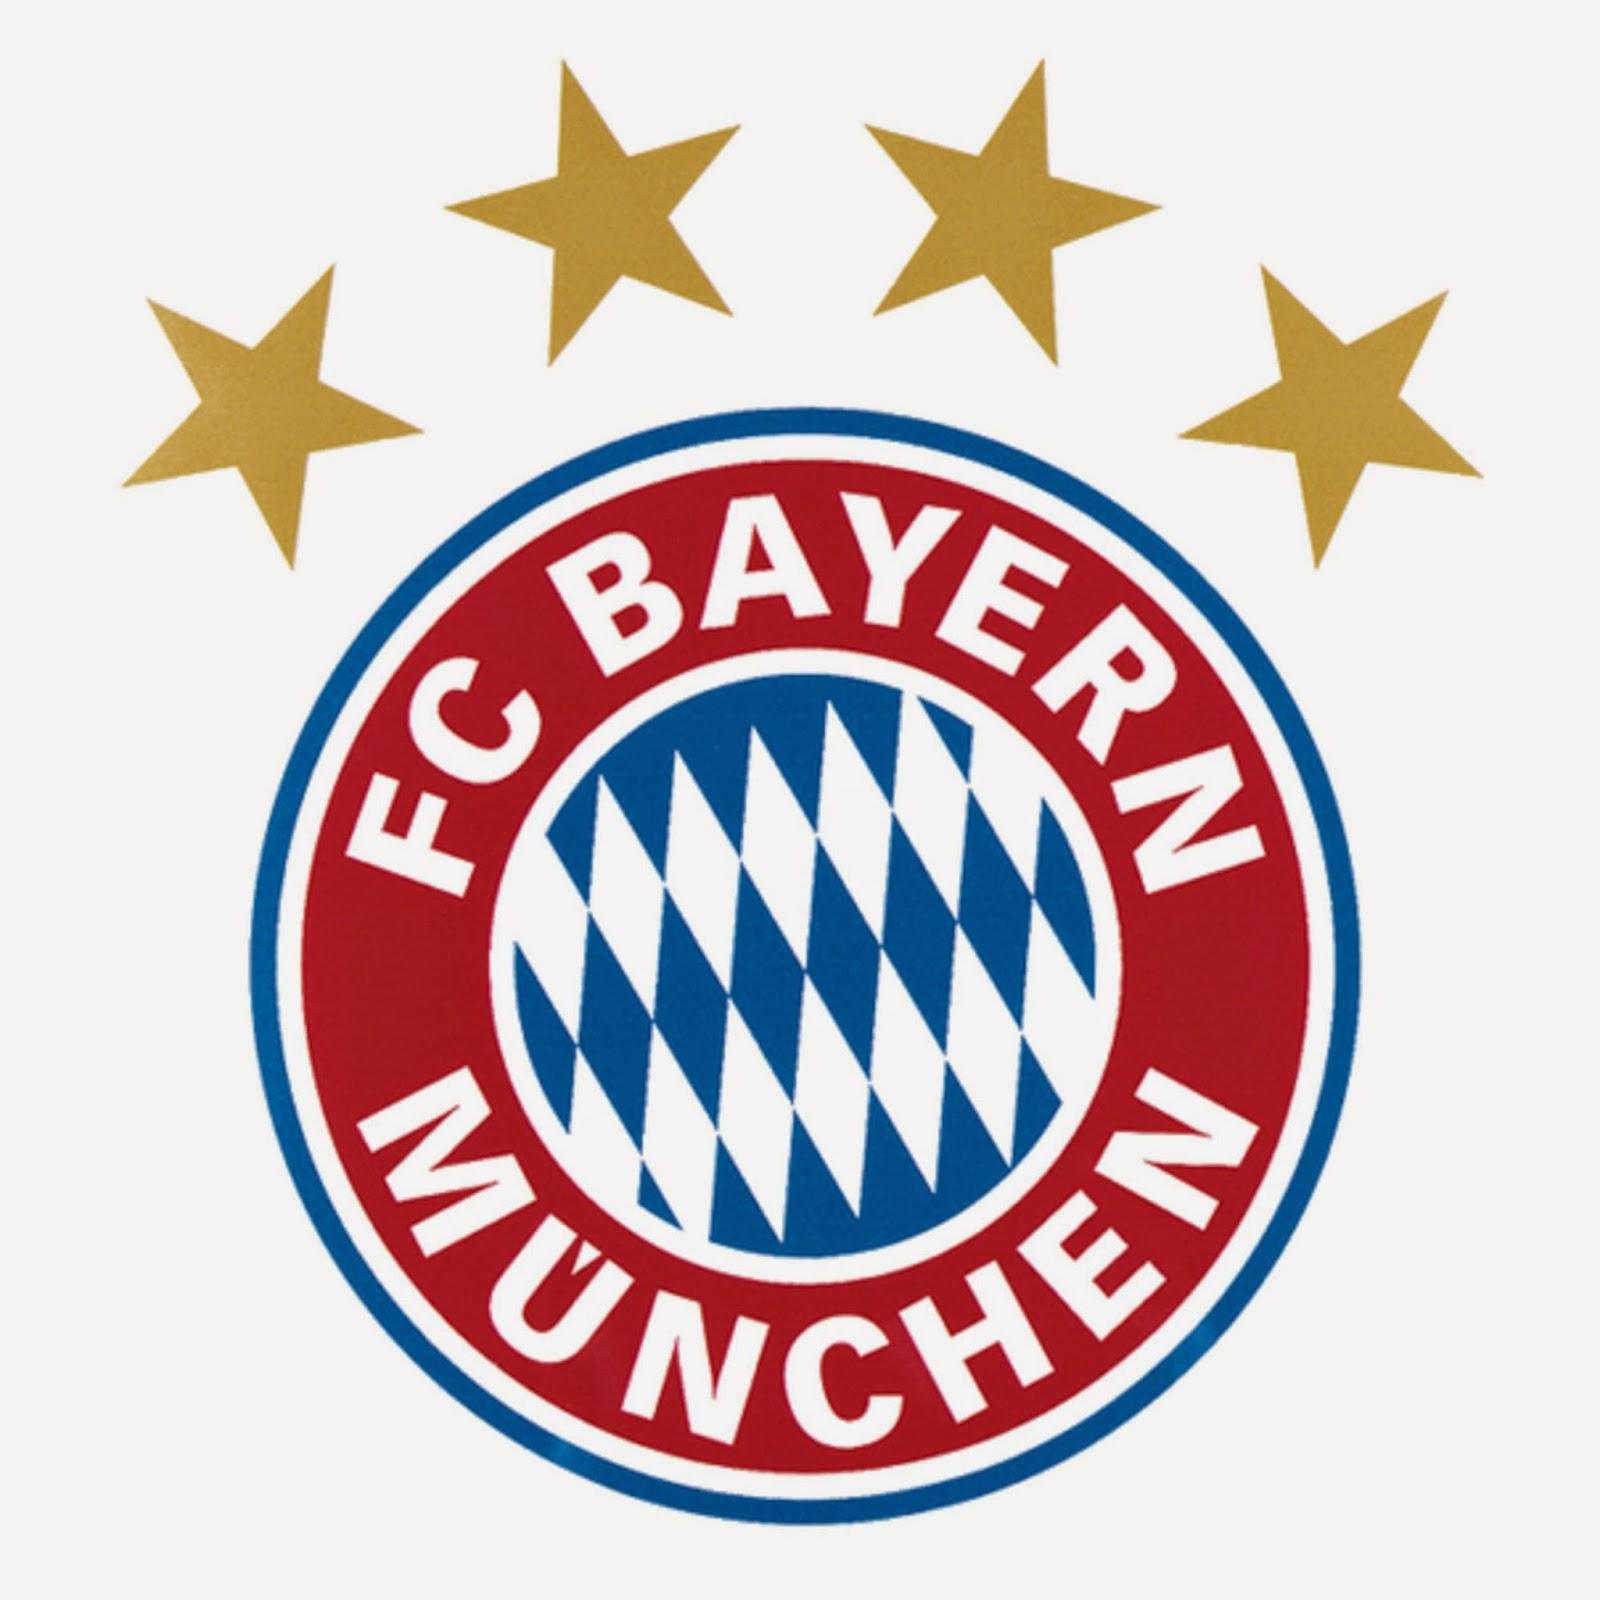 DP BBM Bayern Munchen FC FC Bayern Munich Display Picture Muda